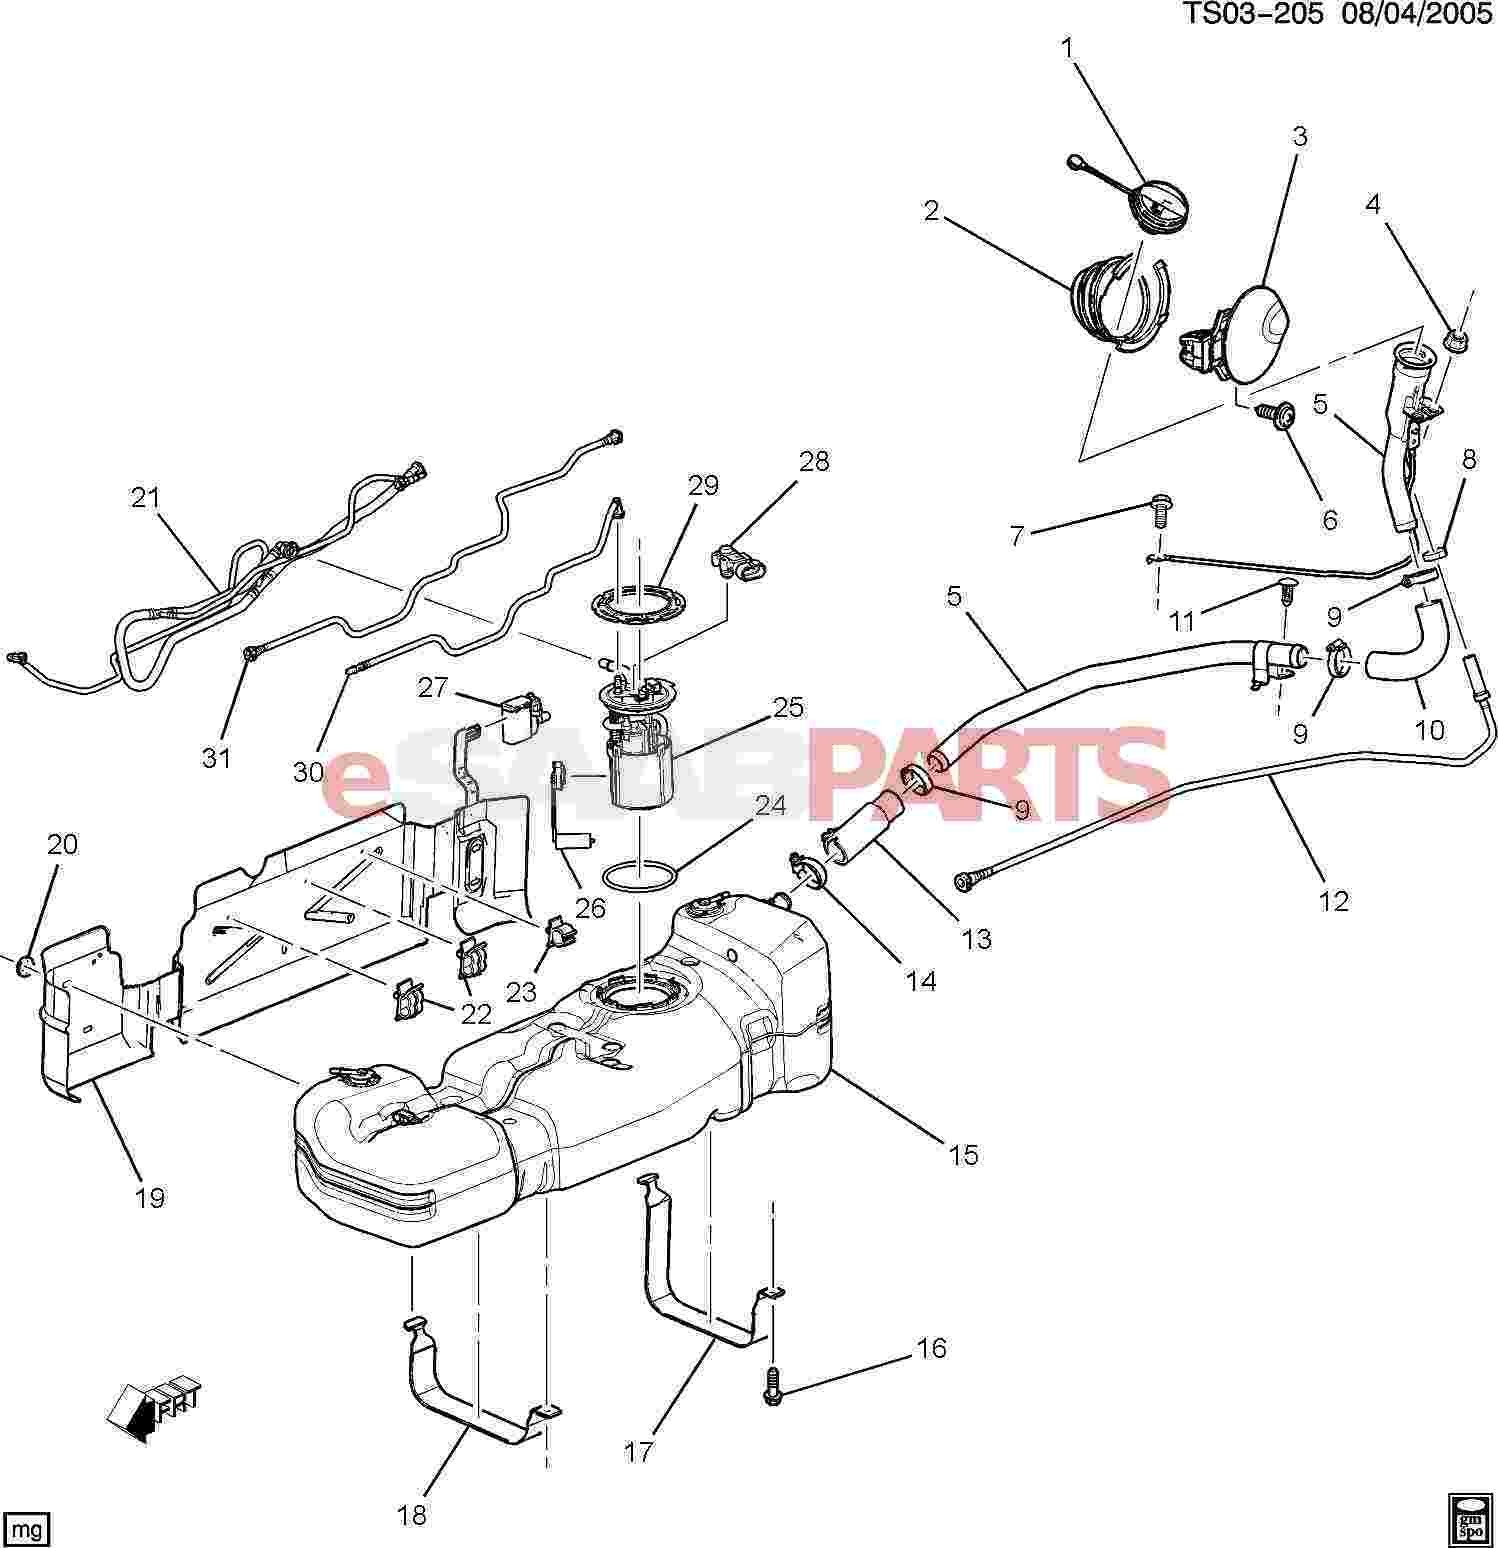 Gas Engine Parts Diagram Esaabparts Saab 9 7x Engine Parts Fuel System Fuel Tank Of Gas Engine Parts Diagram